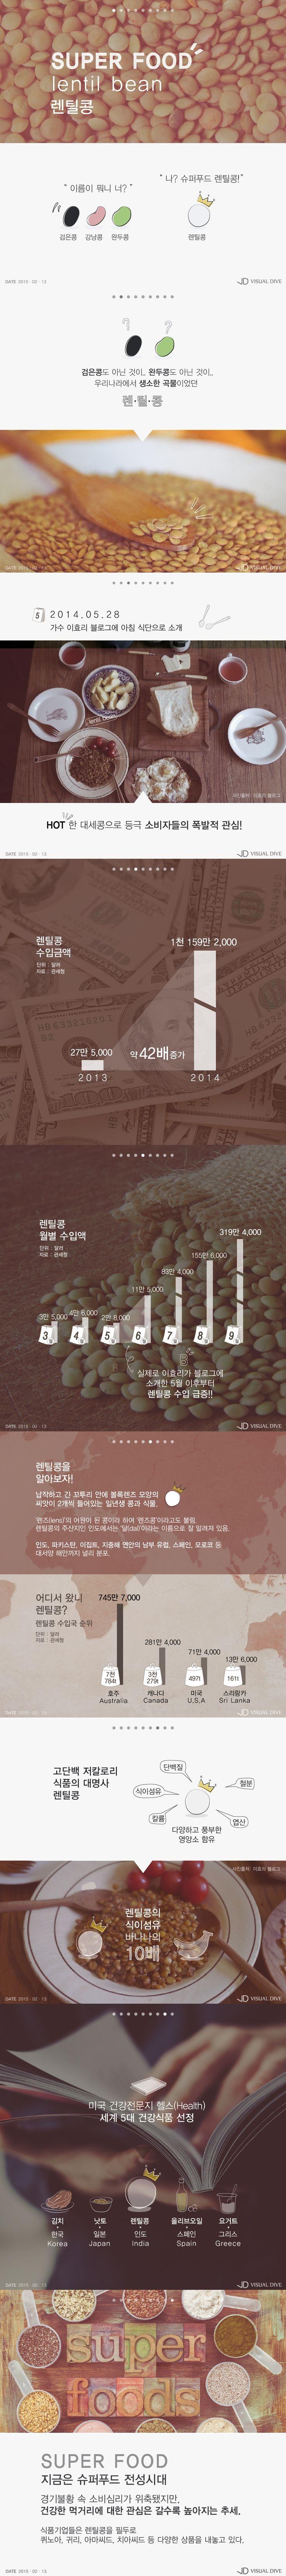 Super Food. Korean's subtlety and simplicity.